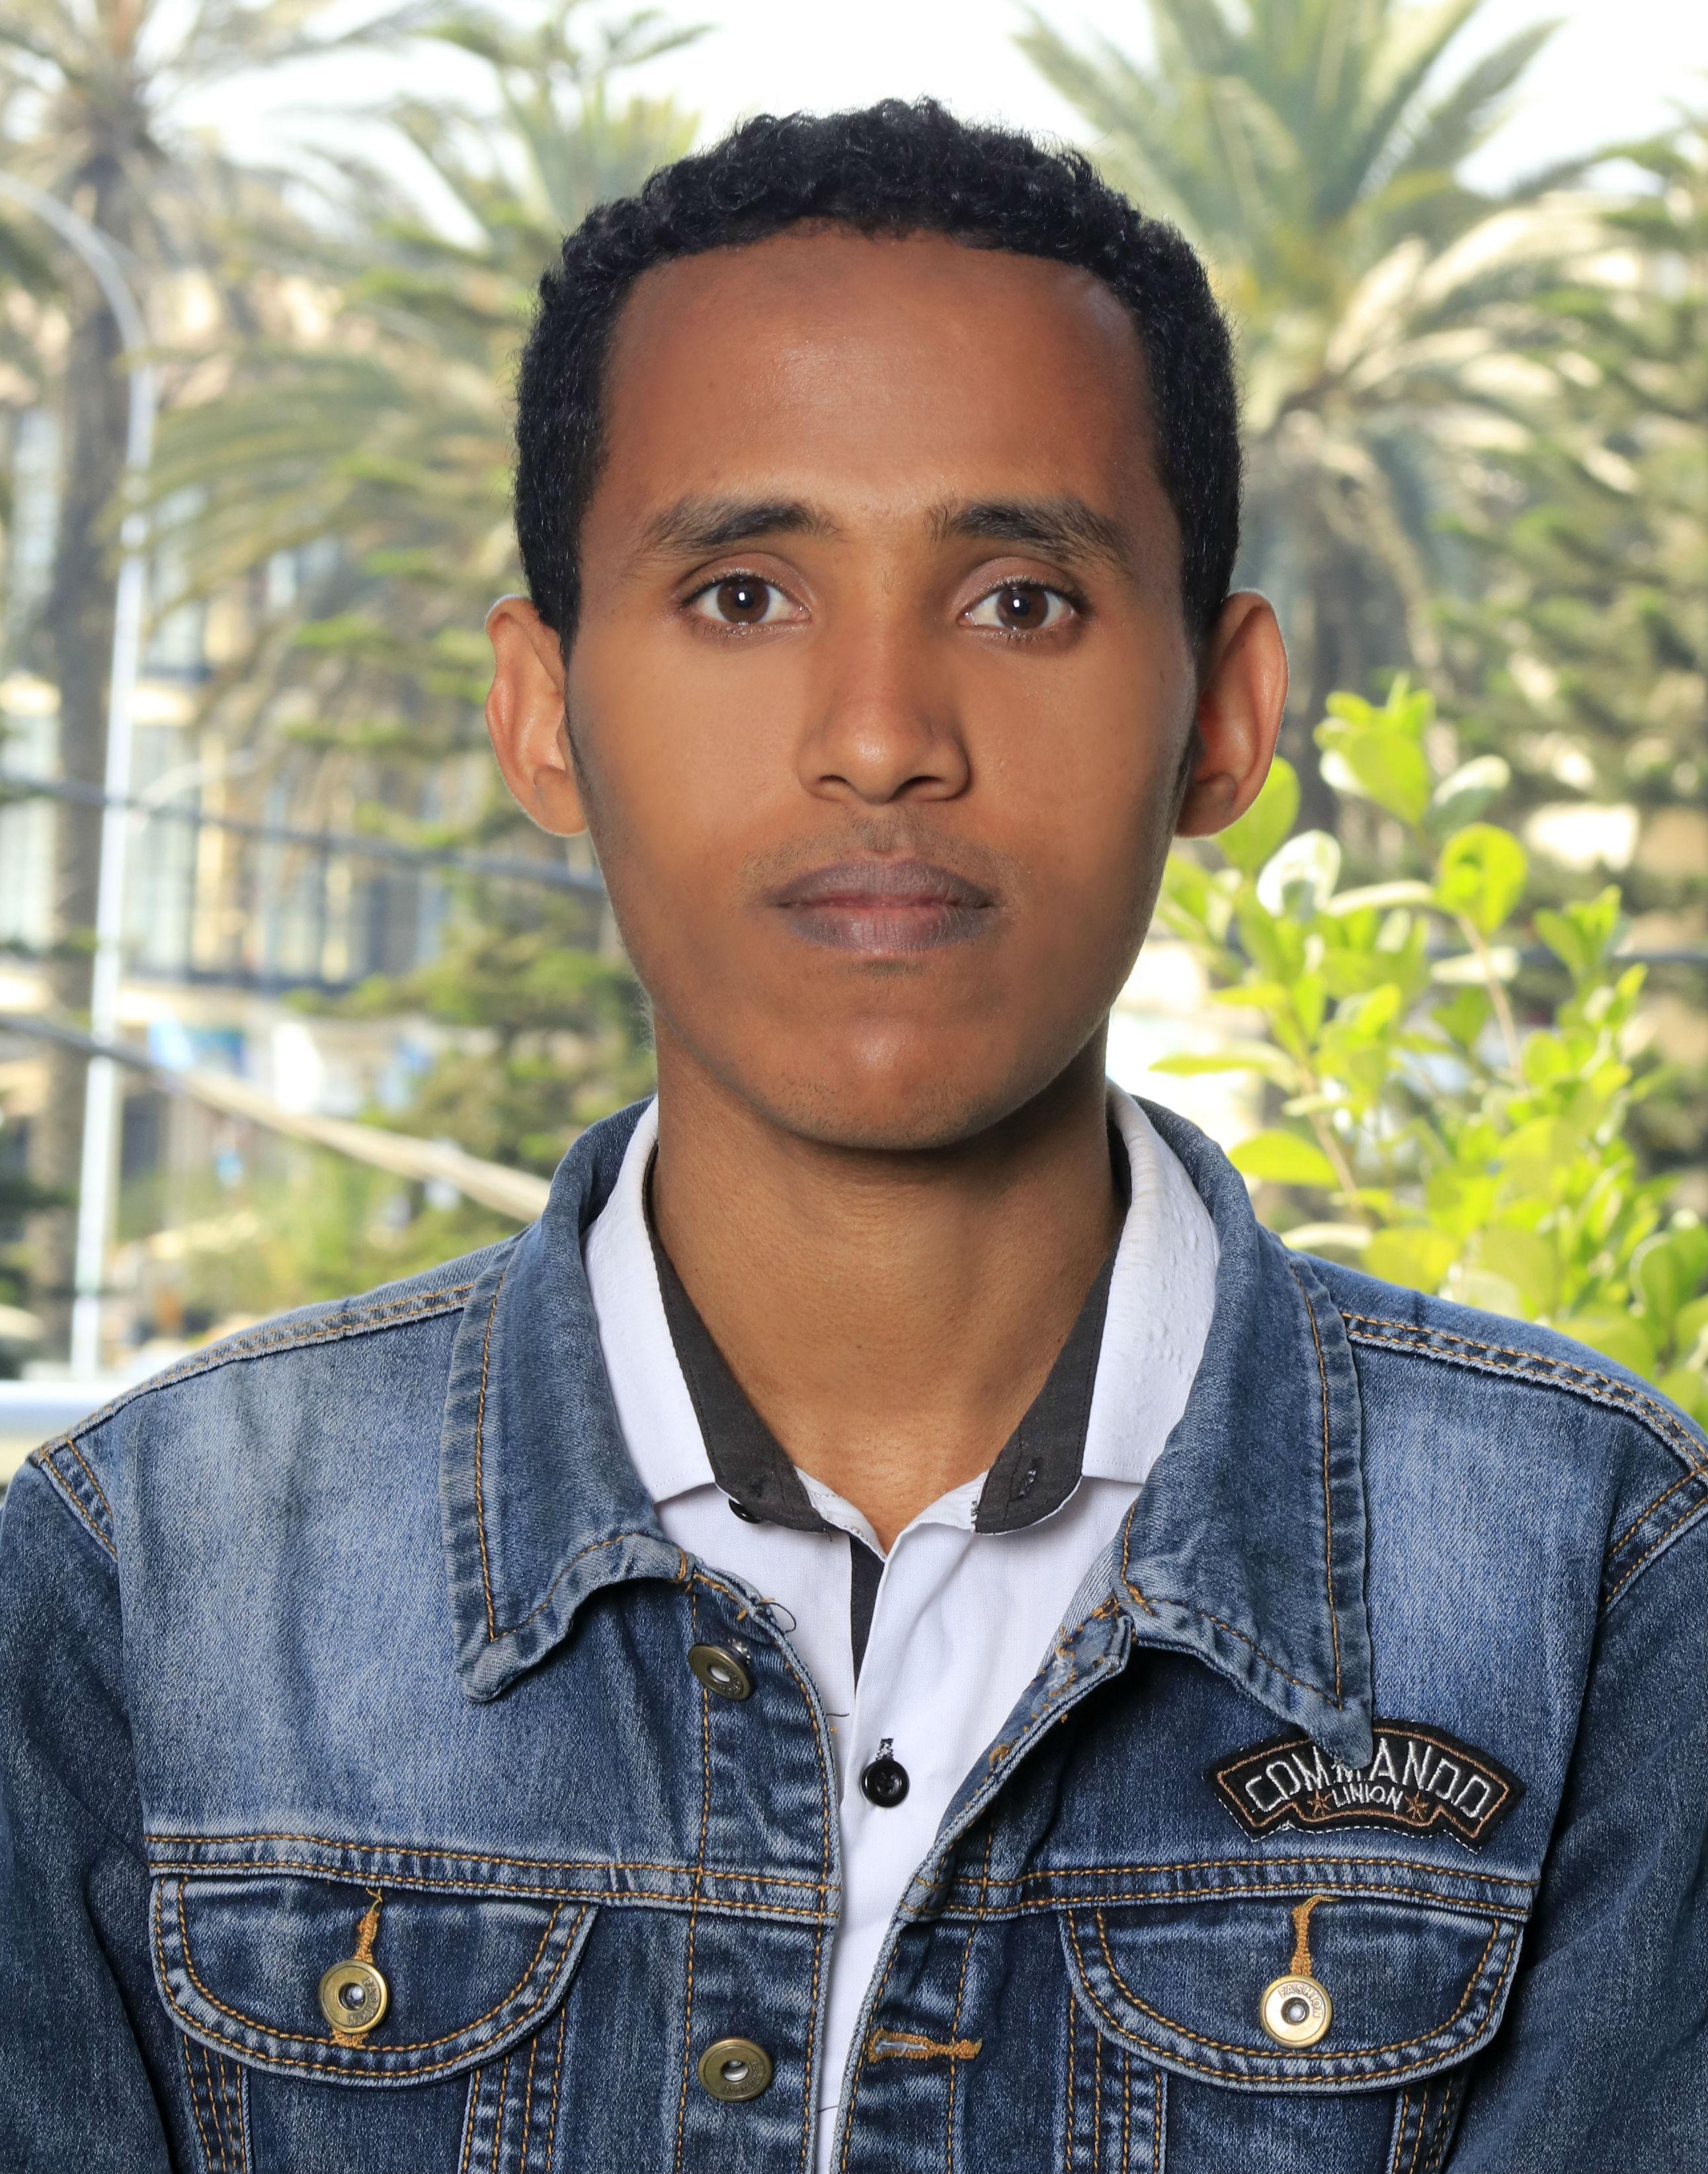 Addis abebe